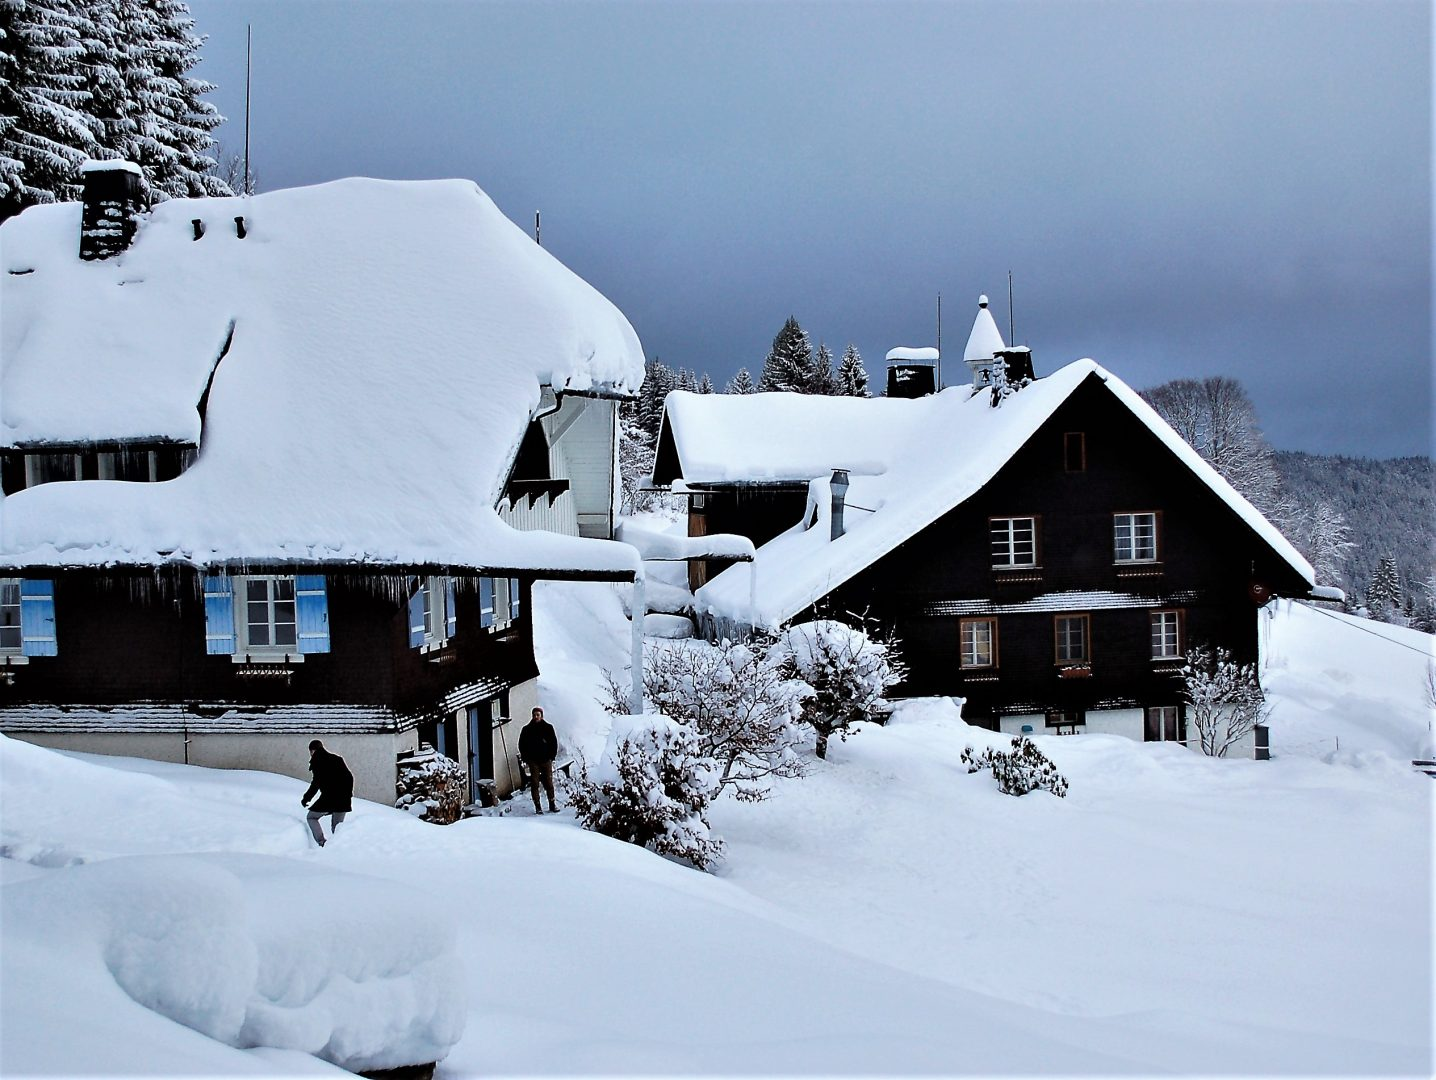 AGV-Klausurtagung im Schwarzwald